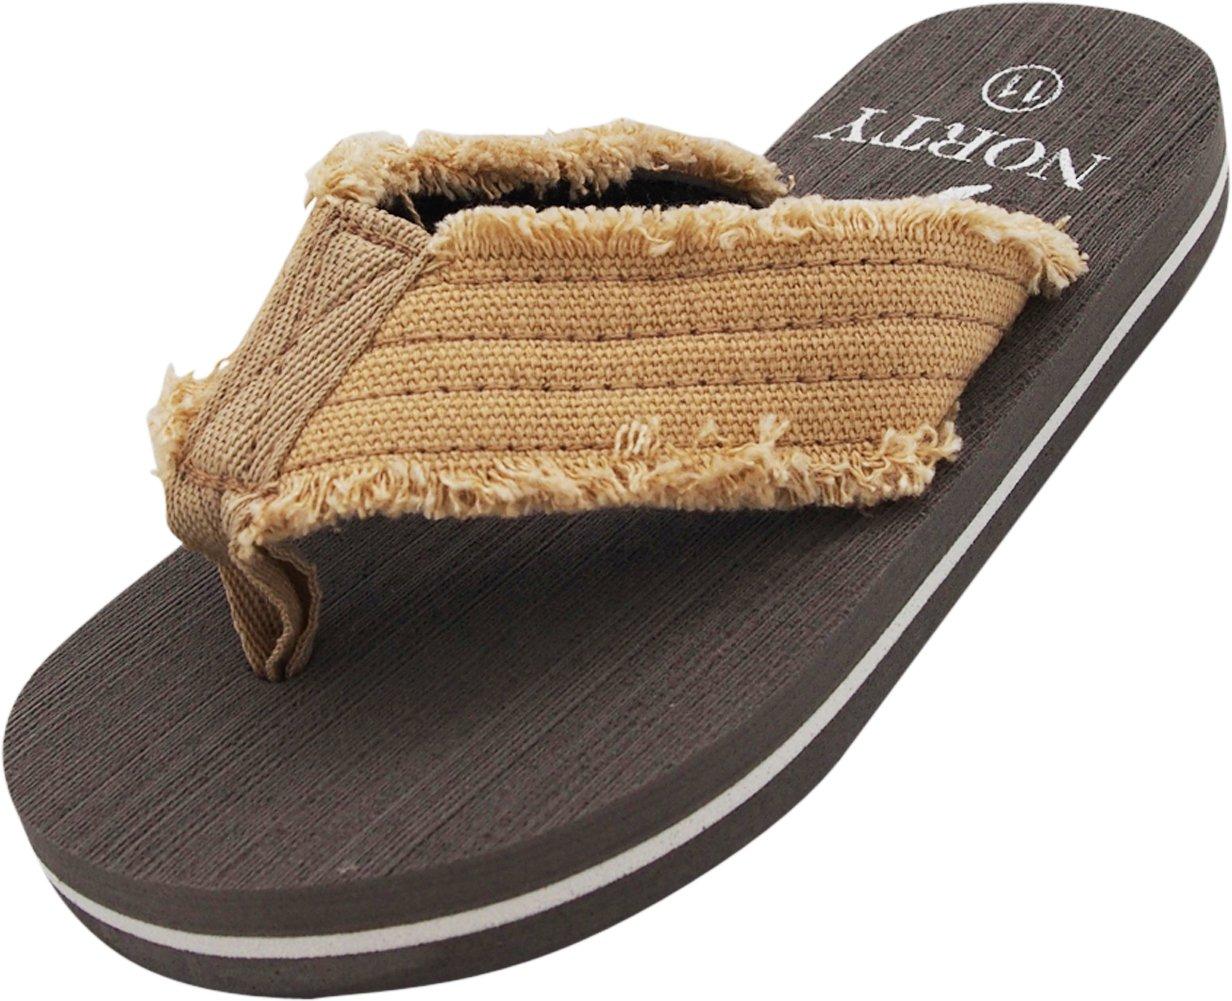 NORTY - Boy's Thong Flip Flop Sandal, Tan, Grey 40578-4MUSBigKid